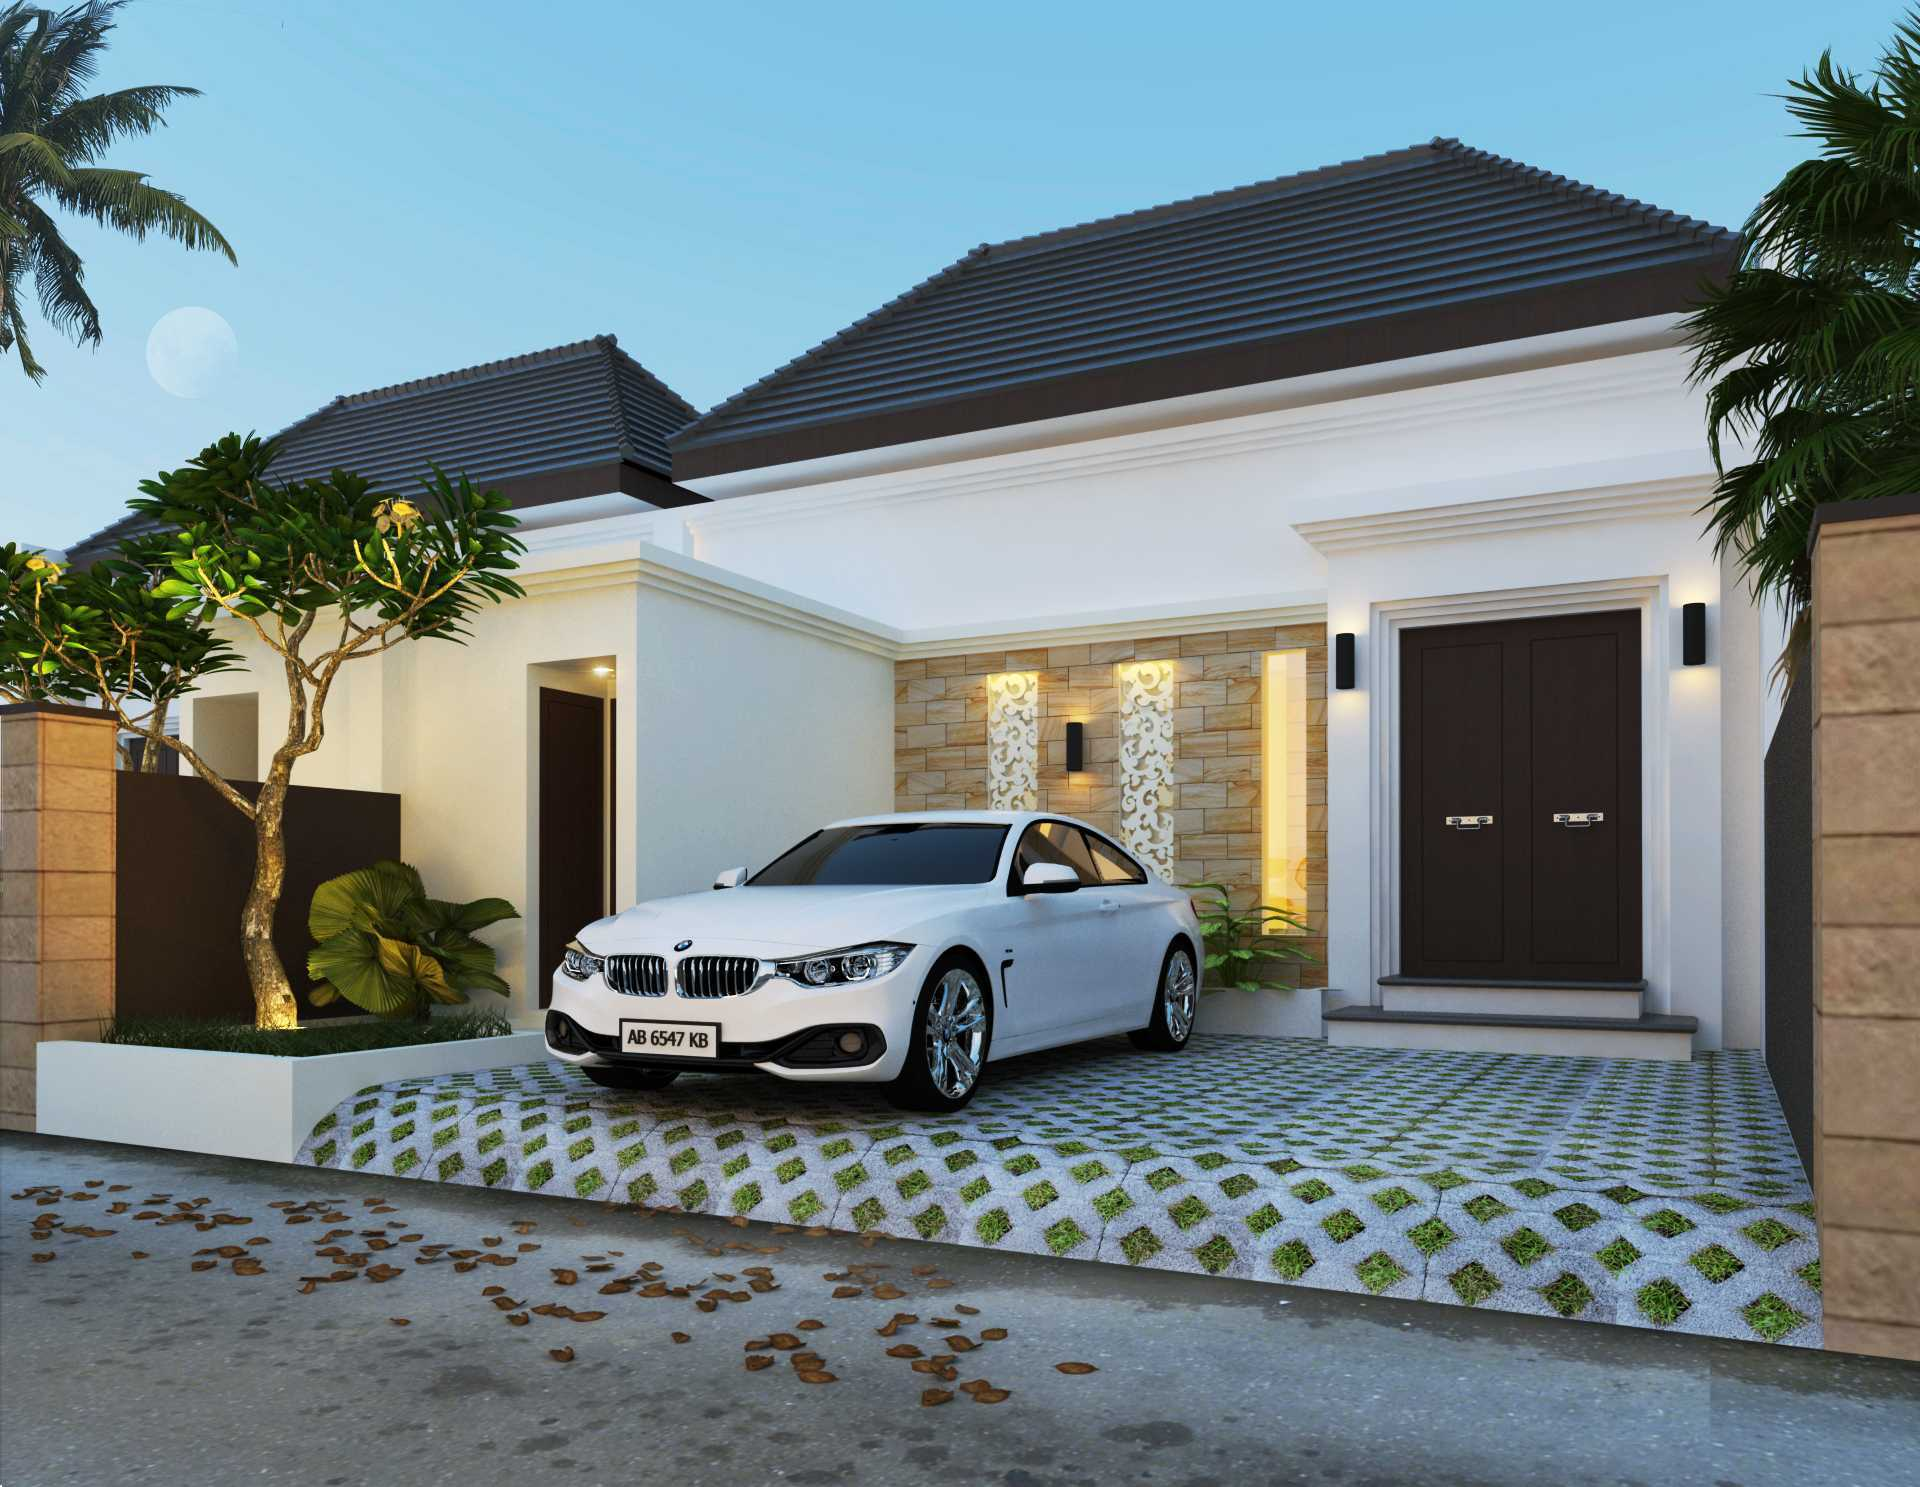 Arsatama Architect Langkung Villa`s - Bali Gianyar, Gianyar Sub-District, Gianyar, Bali, Indonesia Bali, Indonesia Frontlangkung-Villas   23619